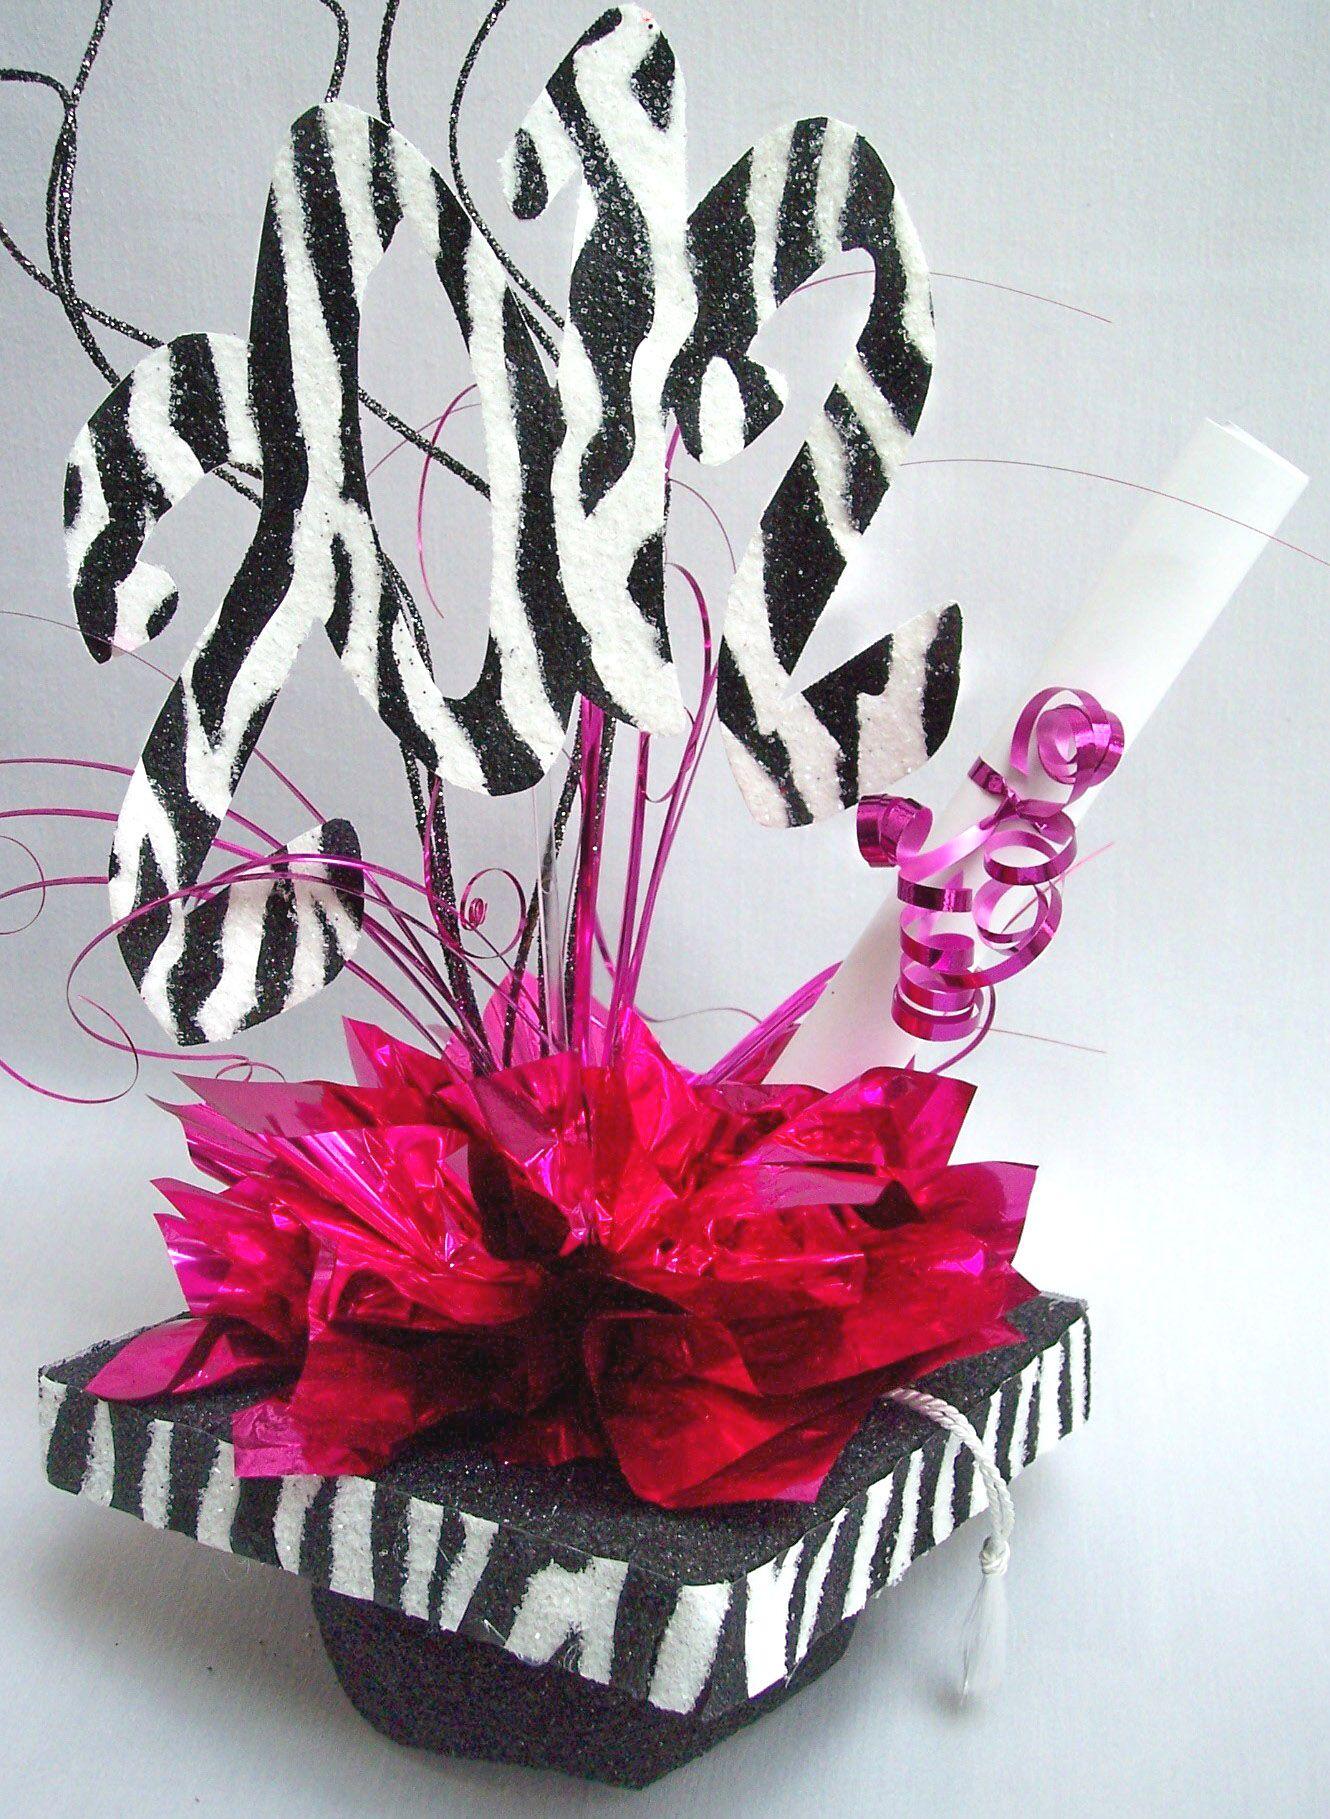 Graduation Party Centerpieces Ideas | Zebra graduation mortar board hat centerpiece | www.DesignsbyGinny.com ...